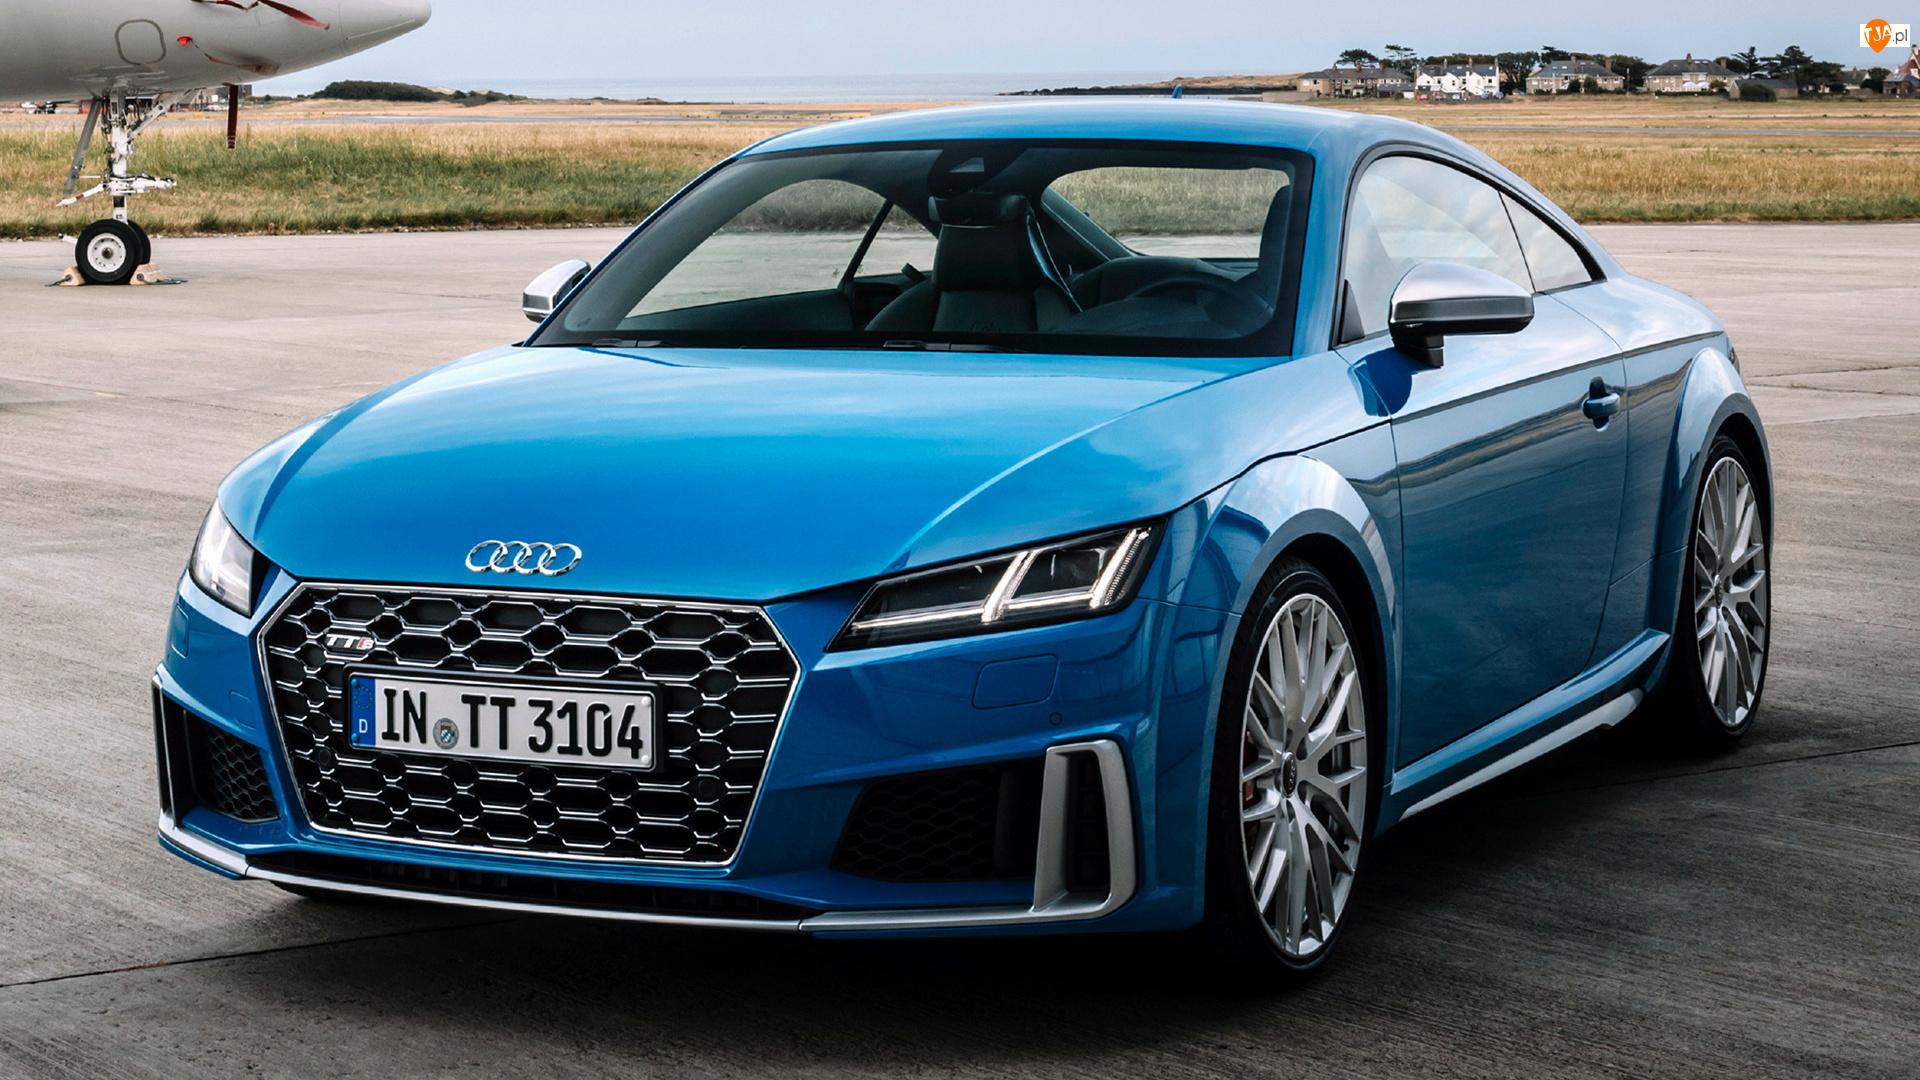 Audi TT S Coupe, Niebieskie